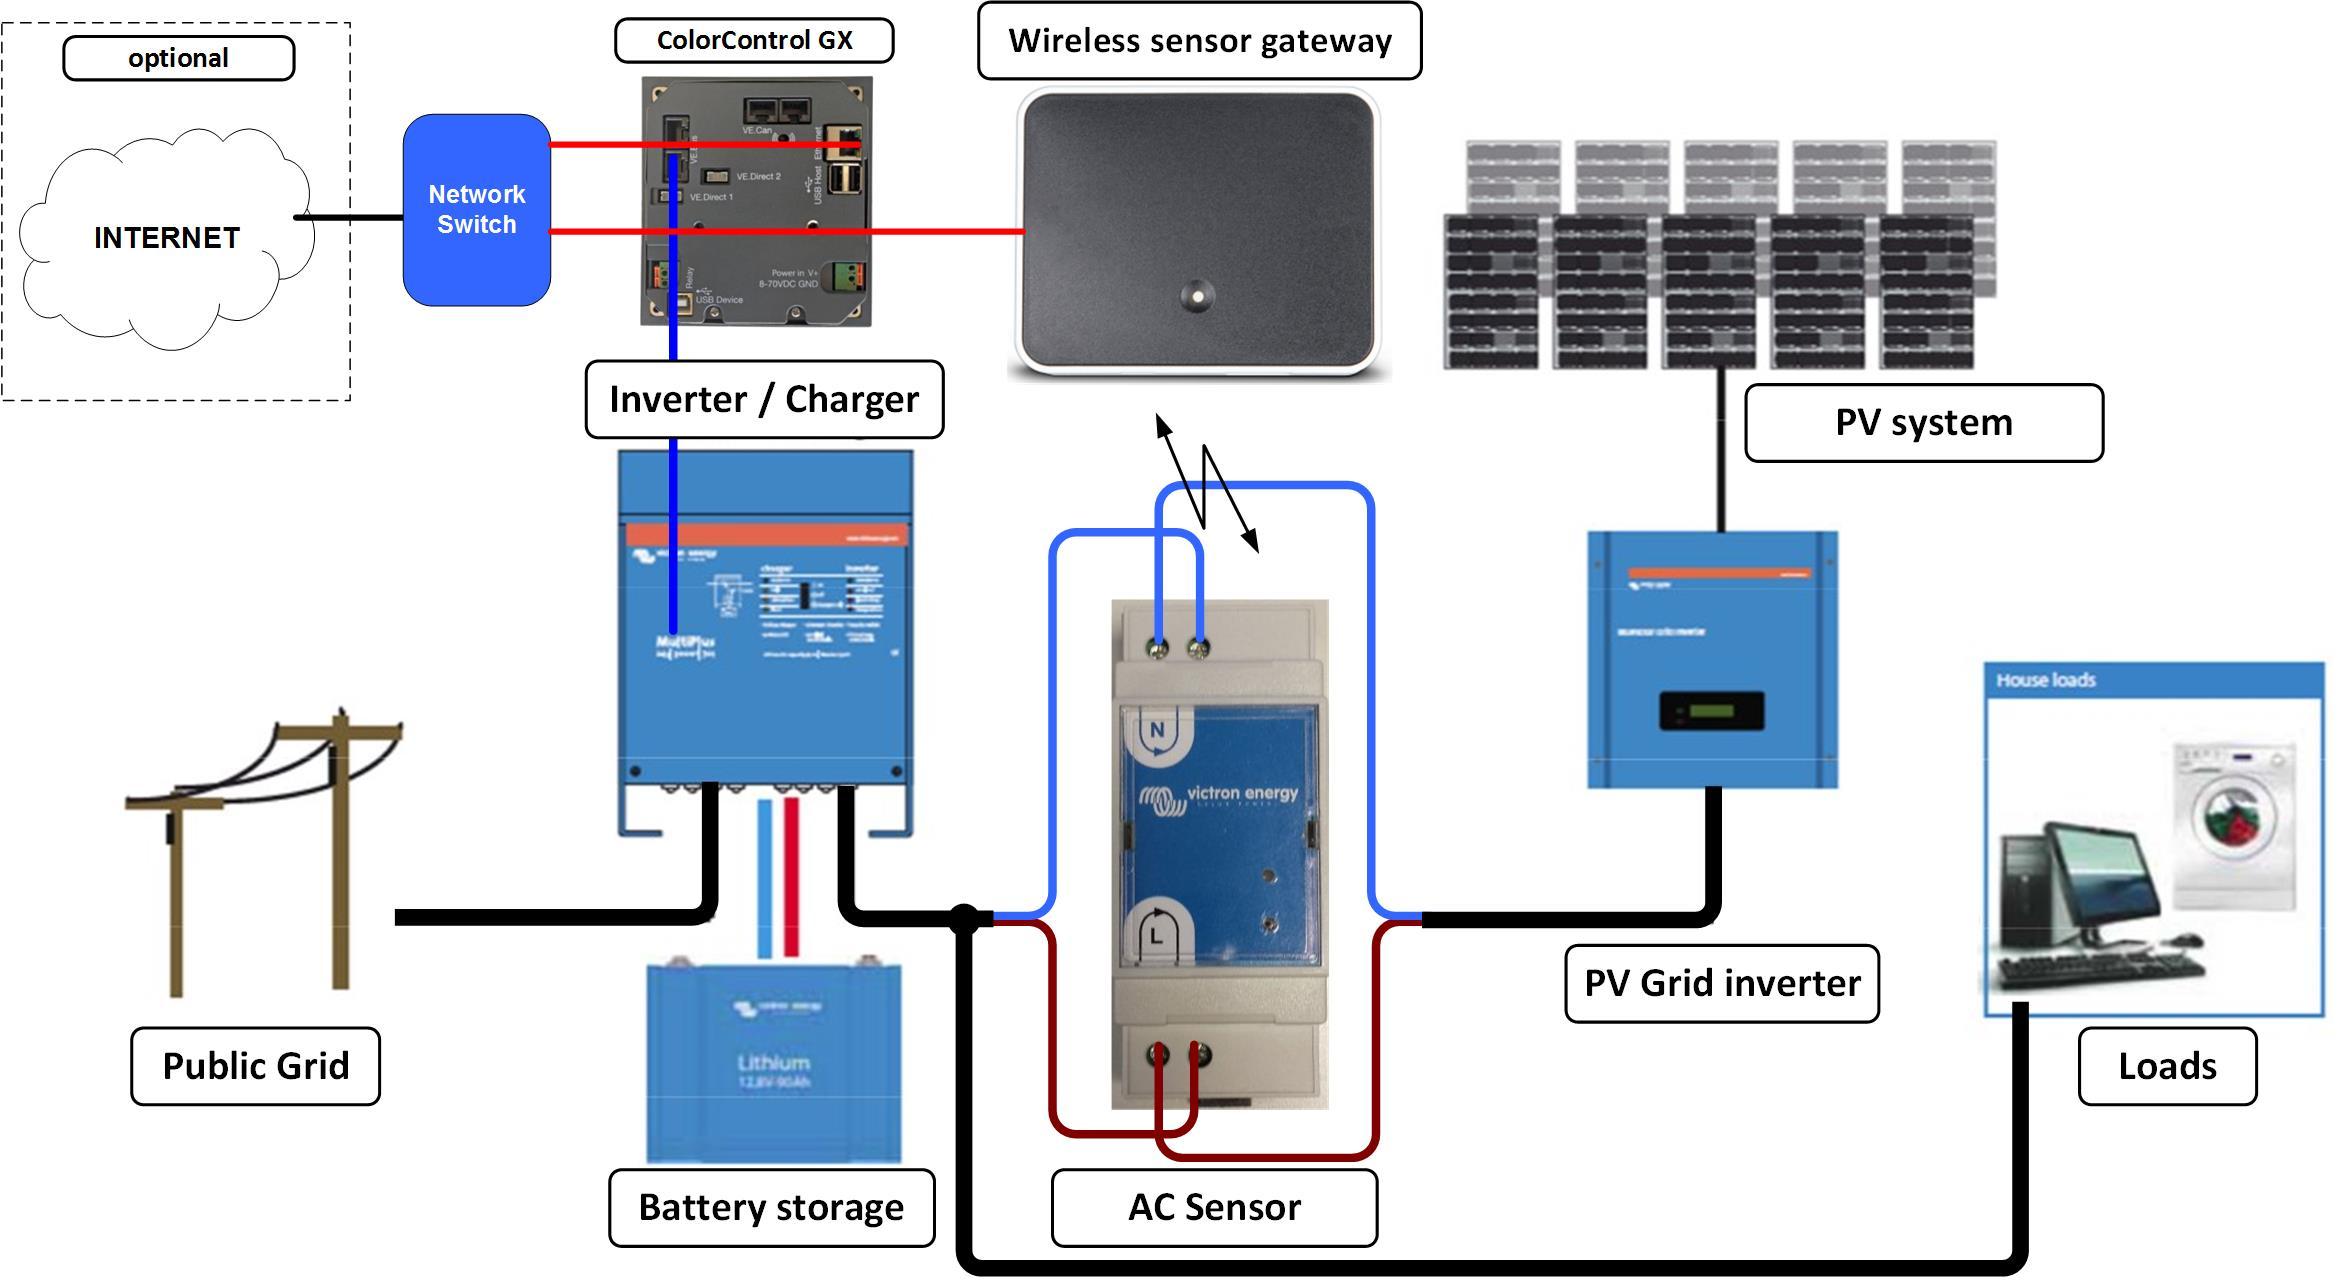 Phoenix Battery Charger Wiring Diagram 38 Images Exide Ccgx Quby Gateway Schemaw850tok8bbaf9 Victron Inverter